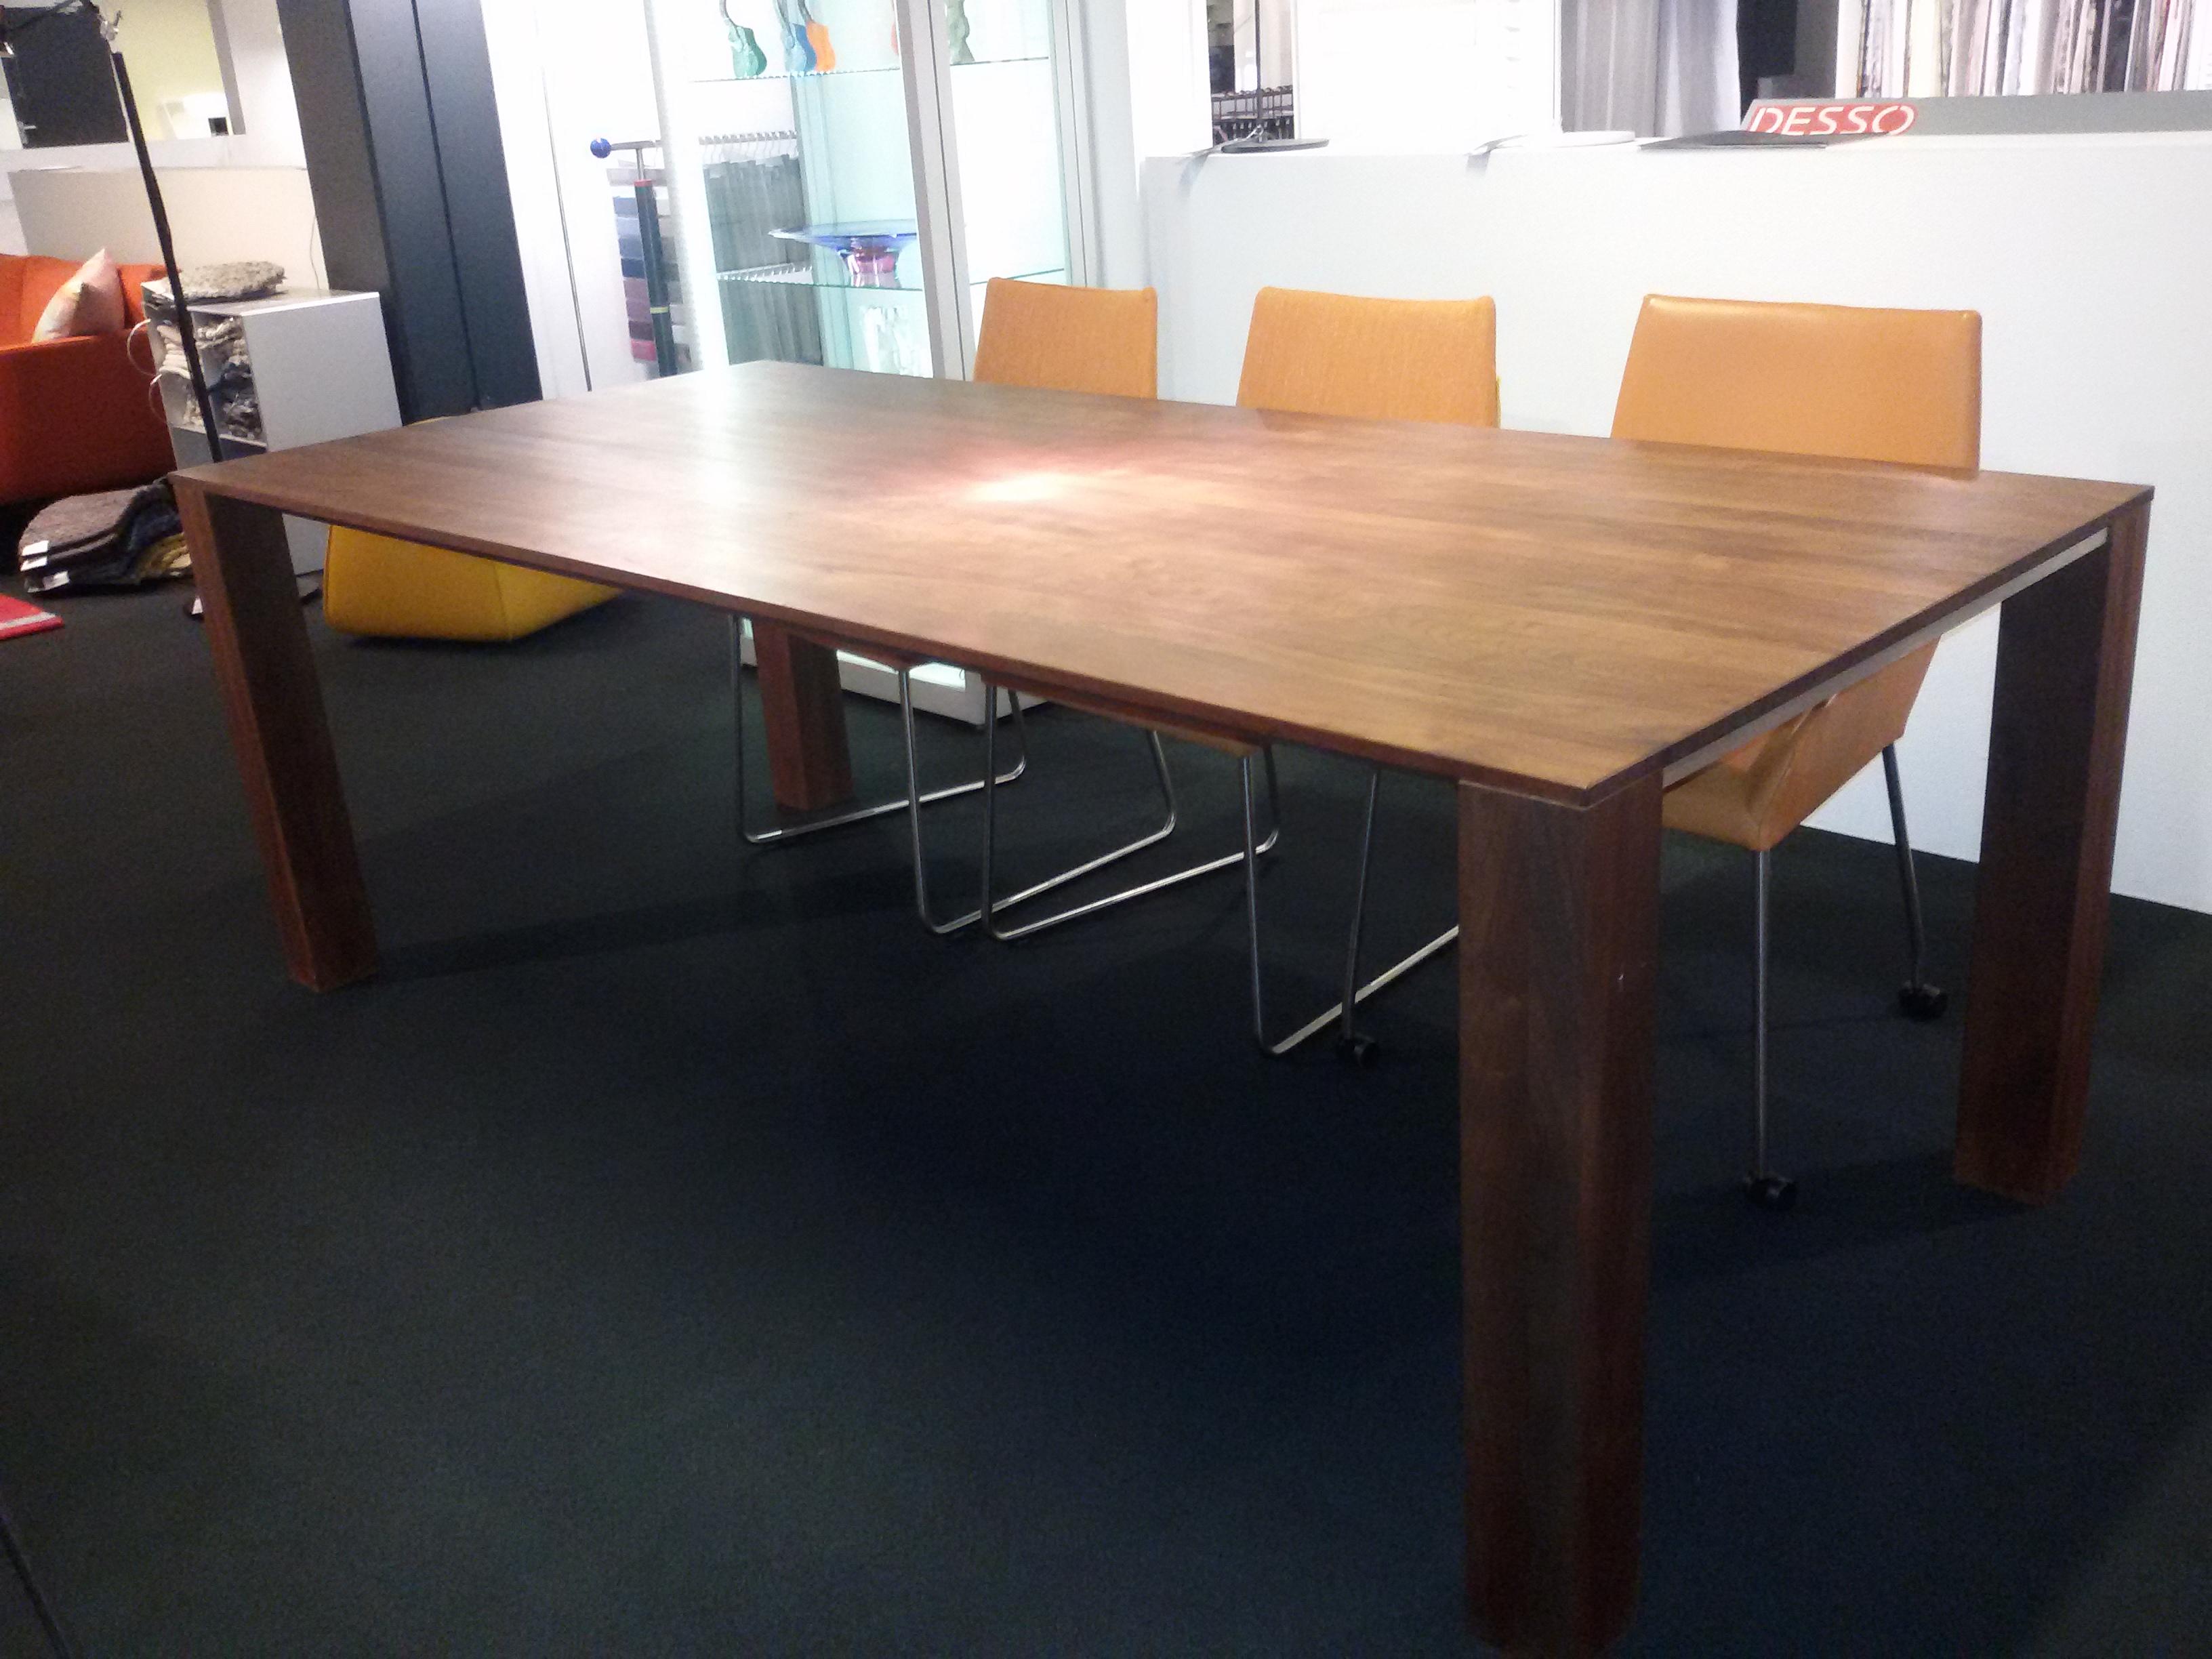 #9F5C2C22363800 Nl.funvit.com Ikea Badkamerkast Hoogglans Wit betrouwbaar Design Meubelen Opruiming 1747 afbeelding opslaan 326424481747 Idee